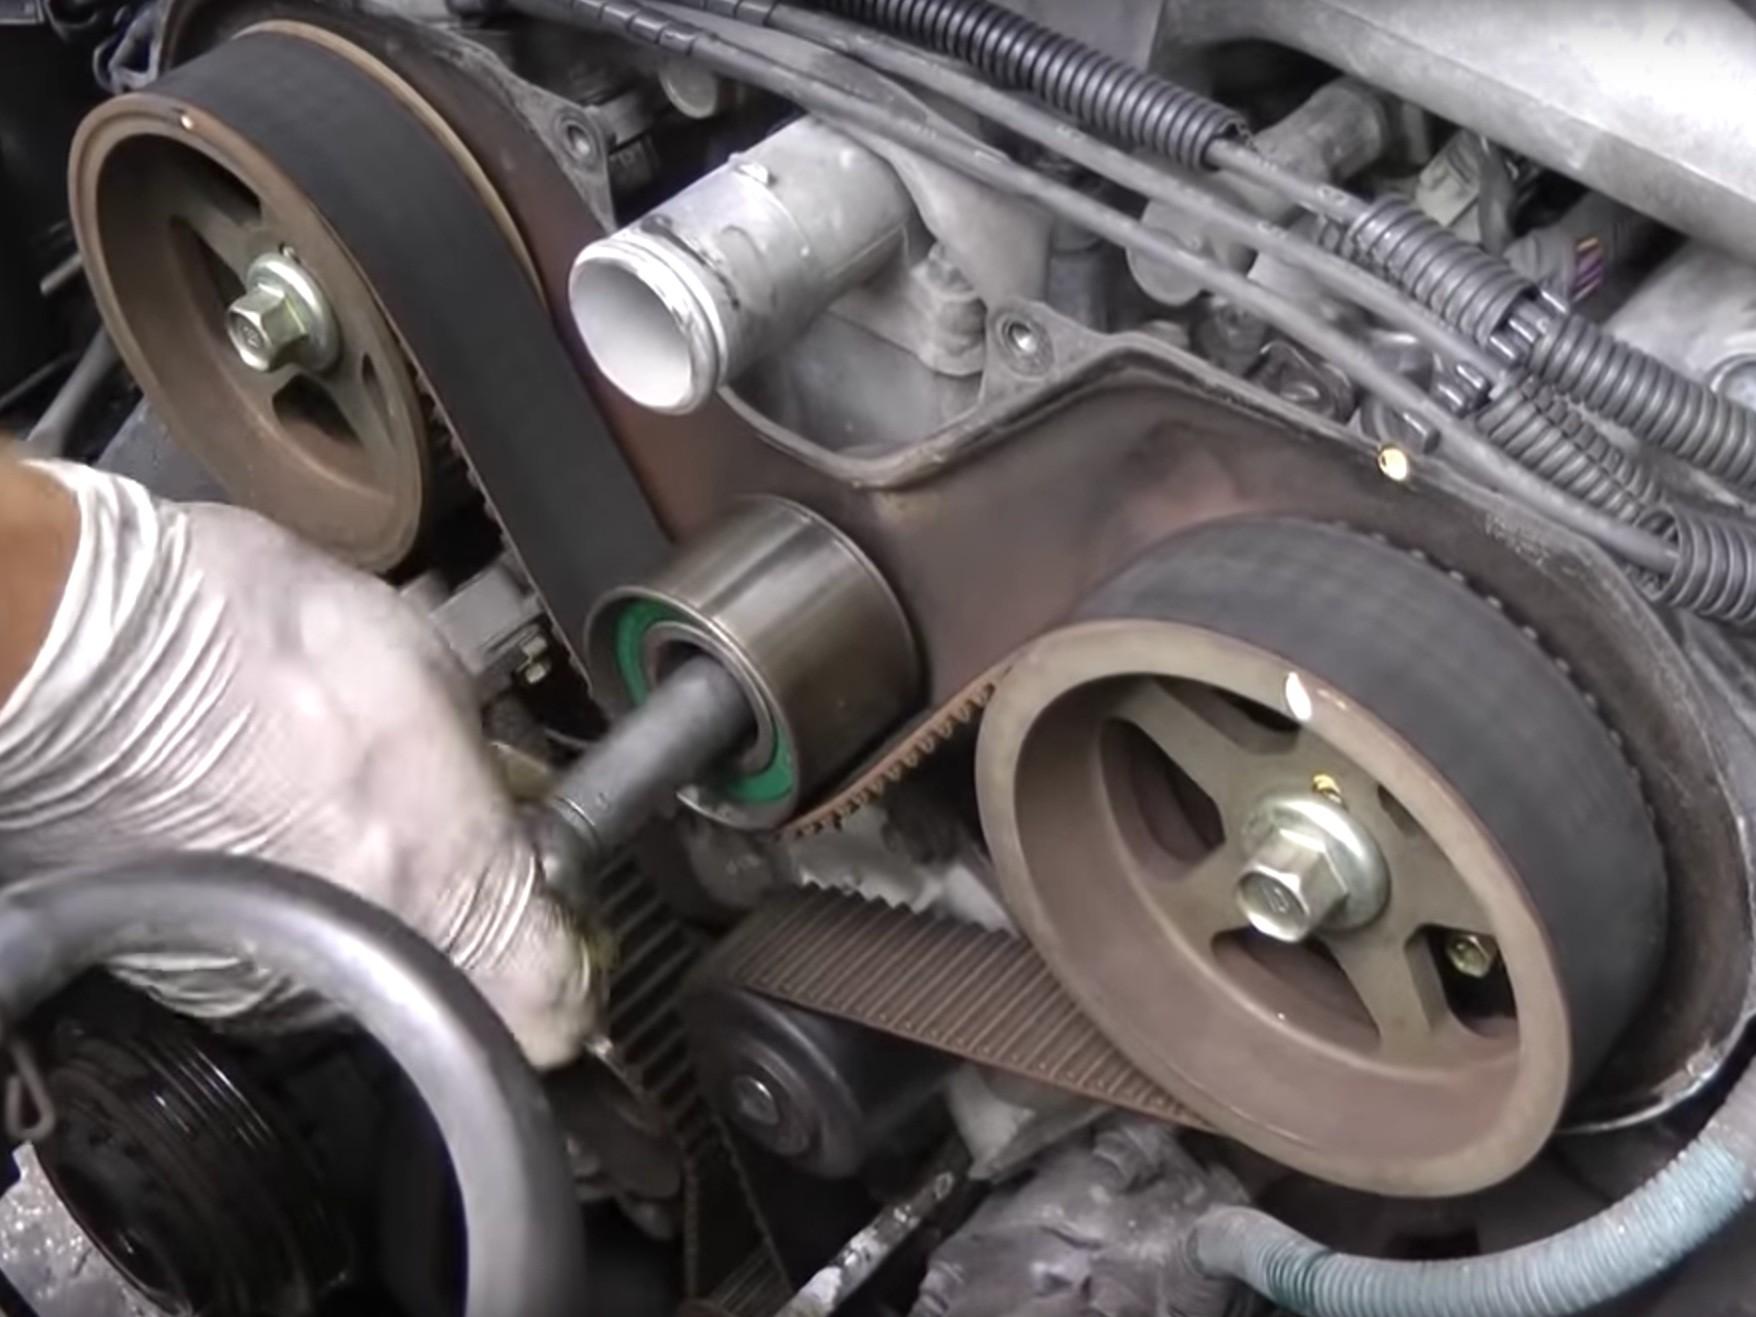 1995 toyota 4runner engine diagram 3rd gen 1996 2002 toyota 4runner rh detoxicrecenze com 2002 toyota tacoma engine diagram 2002 toyota highlander engine diagram